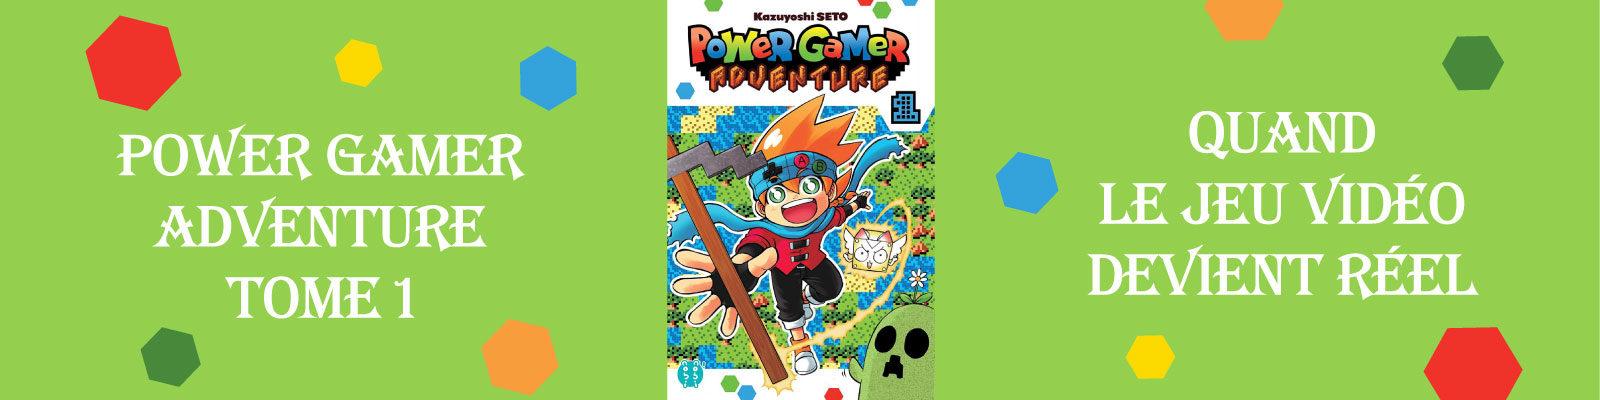 Power Gamer Adventure-Vol.-1